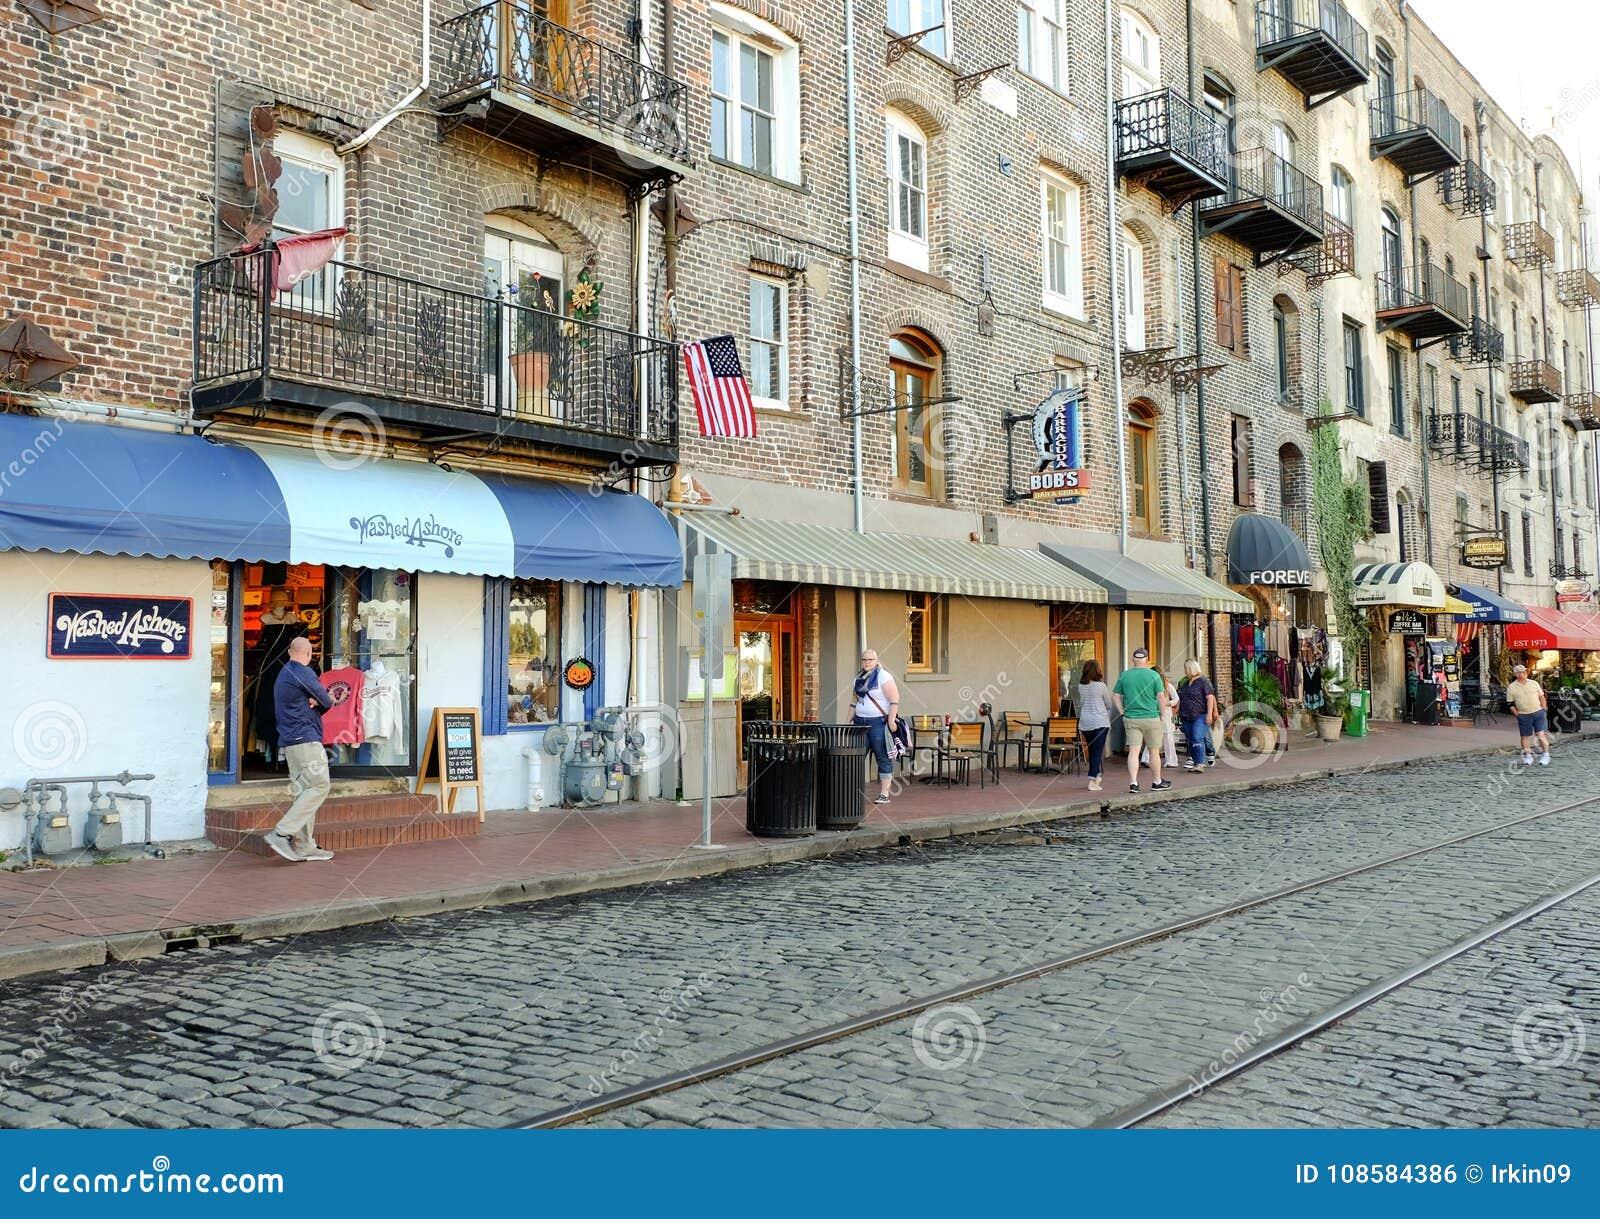 Savannah Georgia Bars And Restaurants On River Street Editorial